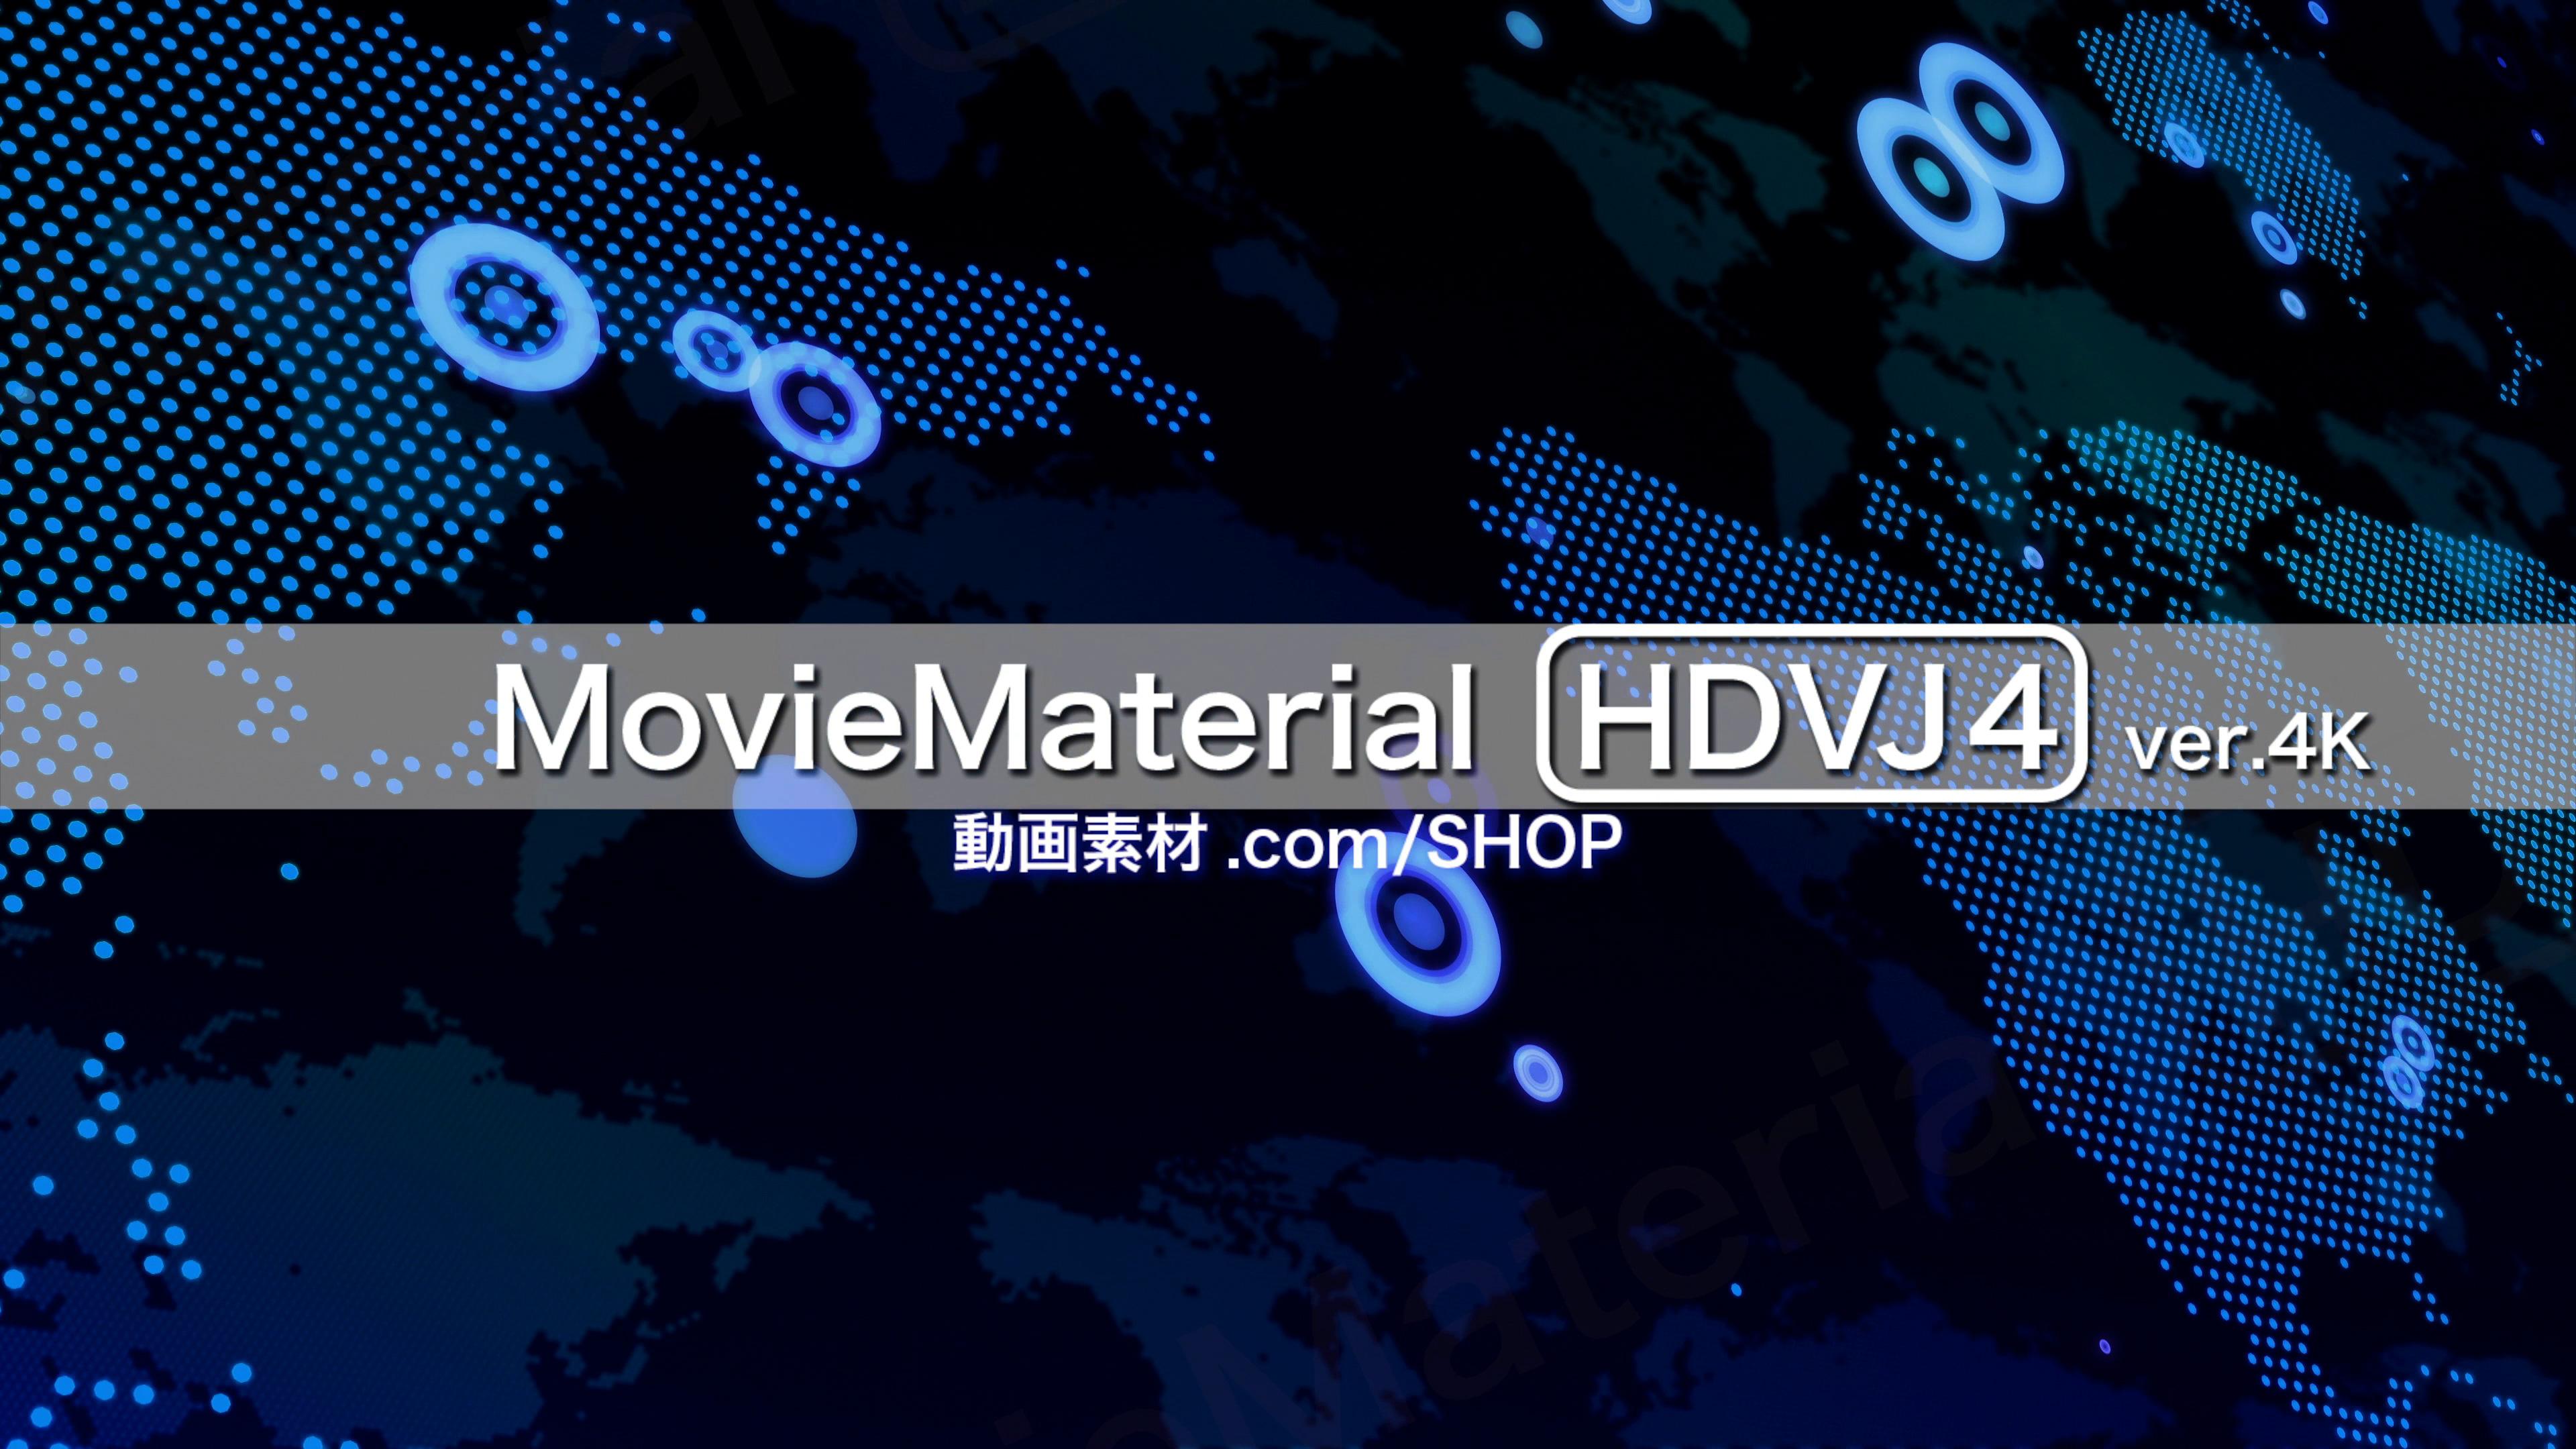 4K2Kループ動画素材集第4段【MovieMaterial HDVJ4 ver.4K】ロイヤリティフリー(著作権使用料無料)3